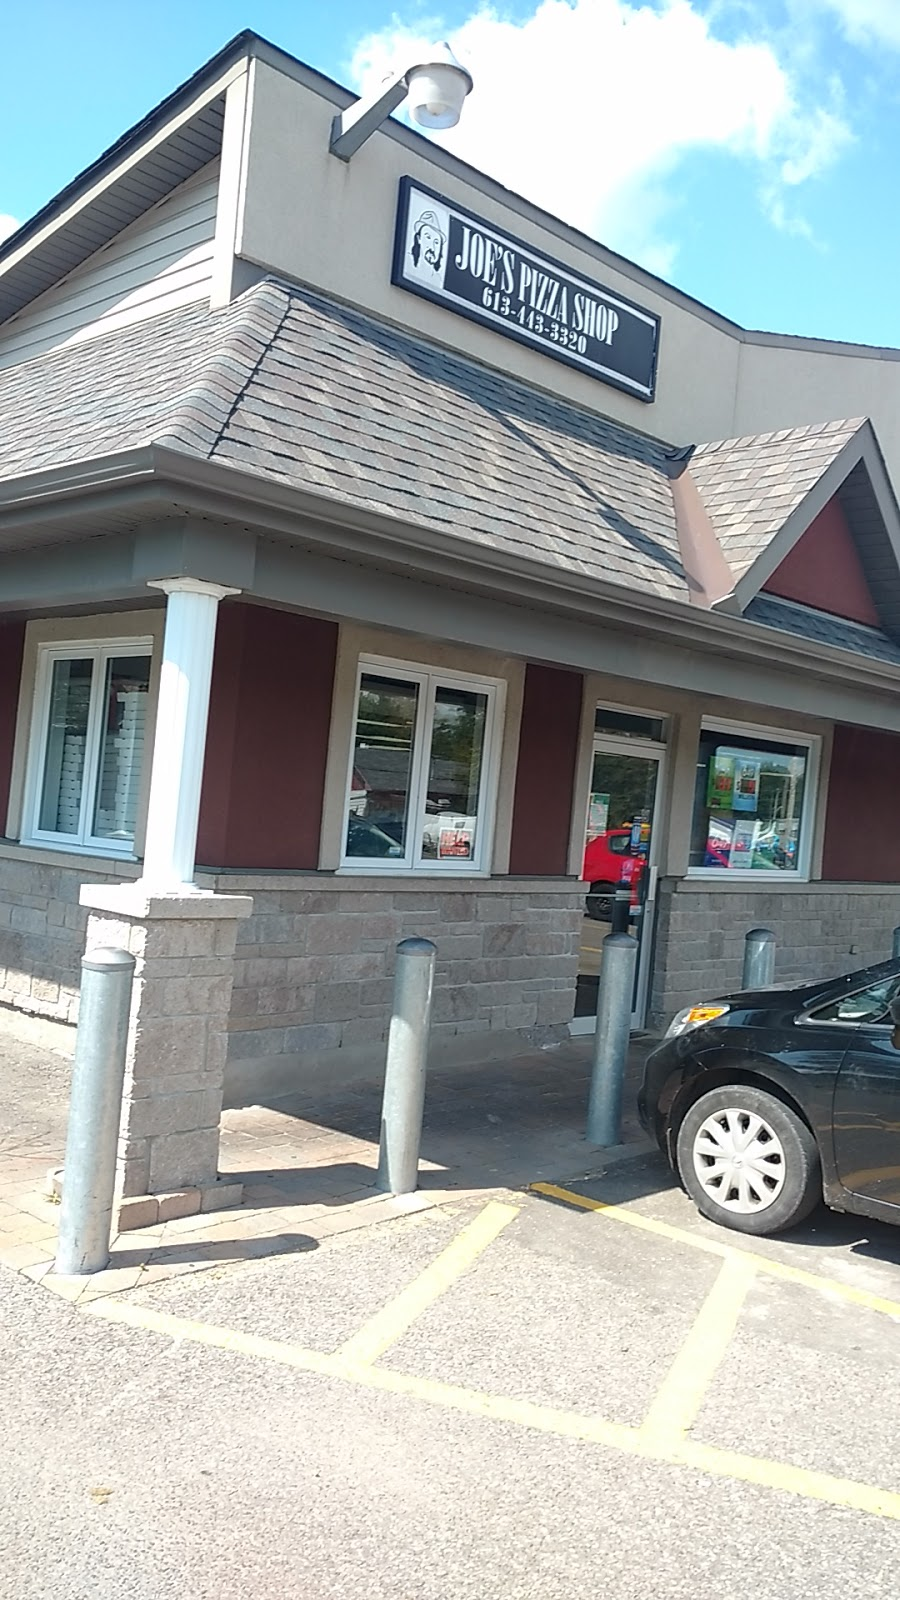 Joes Pizza Shop ???? | restaurant | 550 Limoges Rd, Limoges, ON K0A 2M0, Canada | 6134433320 OR +1 613-443-3320